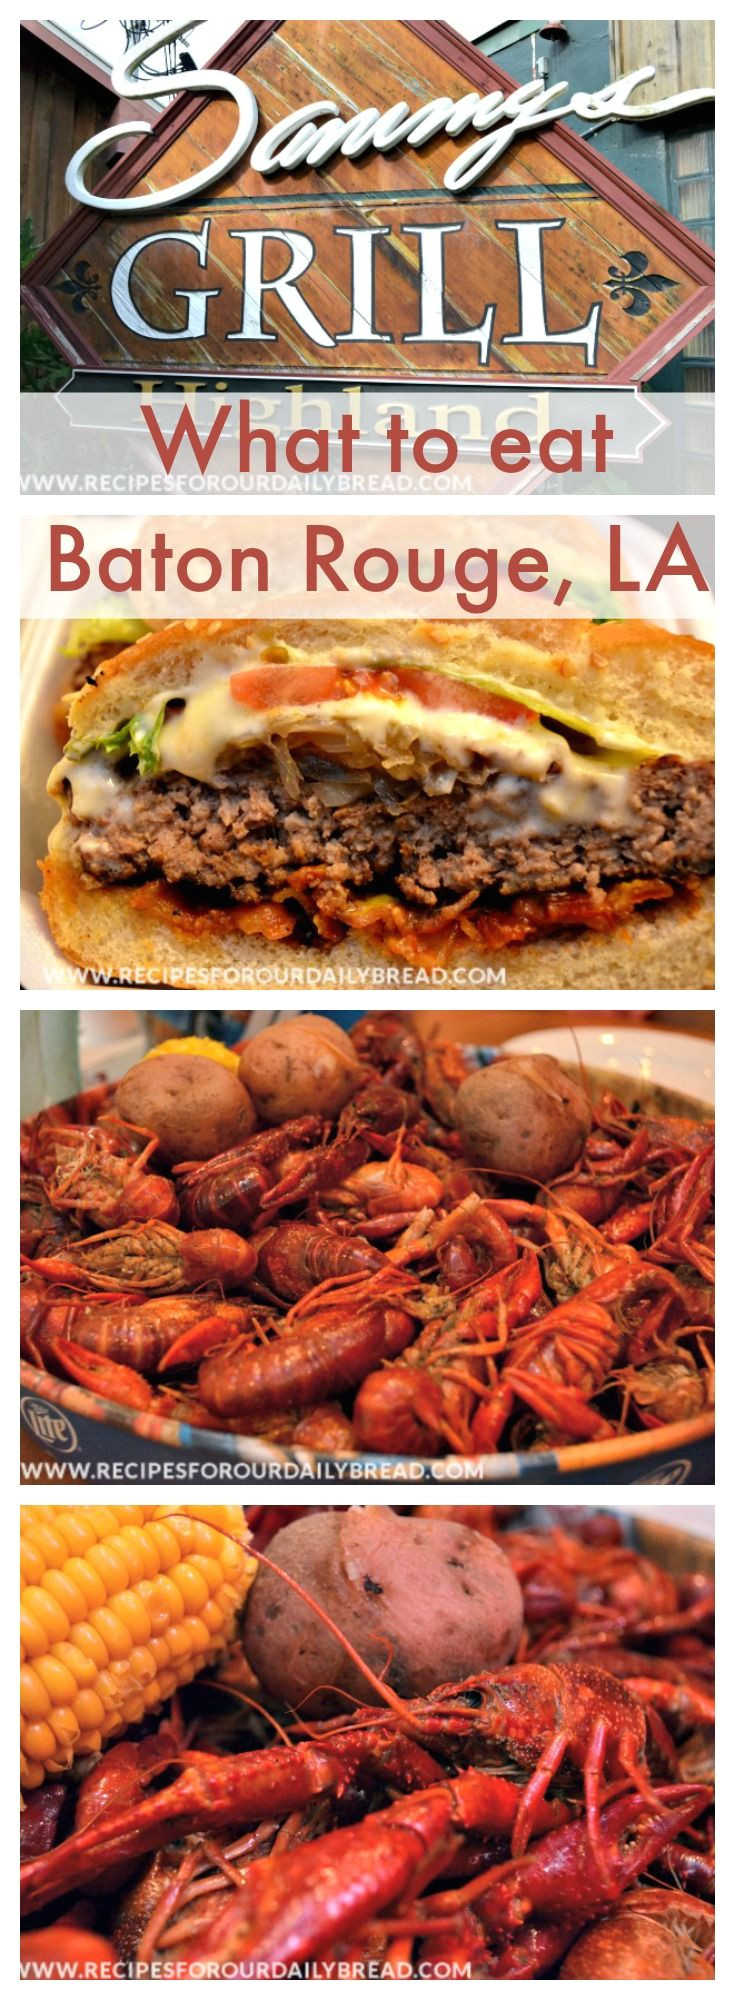 K Street Grill Baton Rouge 133 Best Amerika Reisen Images On Pinterest Adventure Beaches and